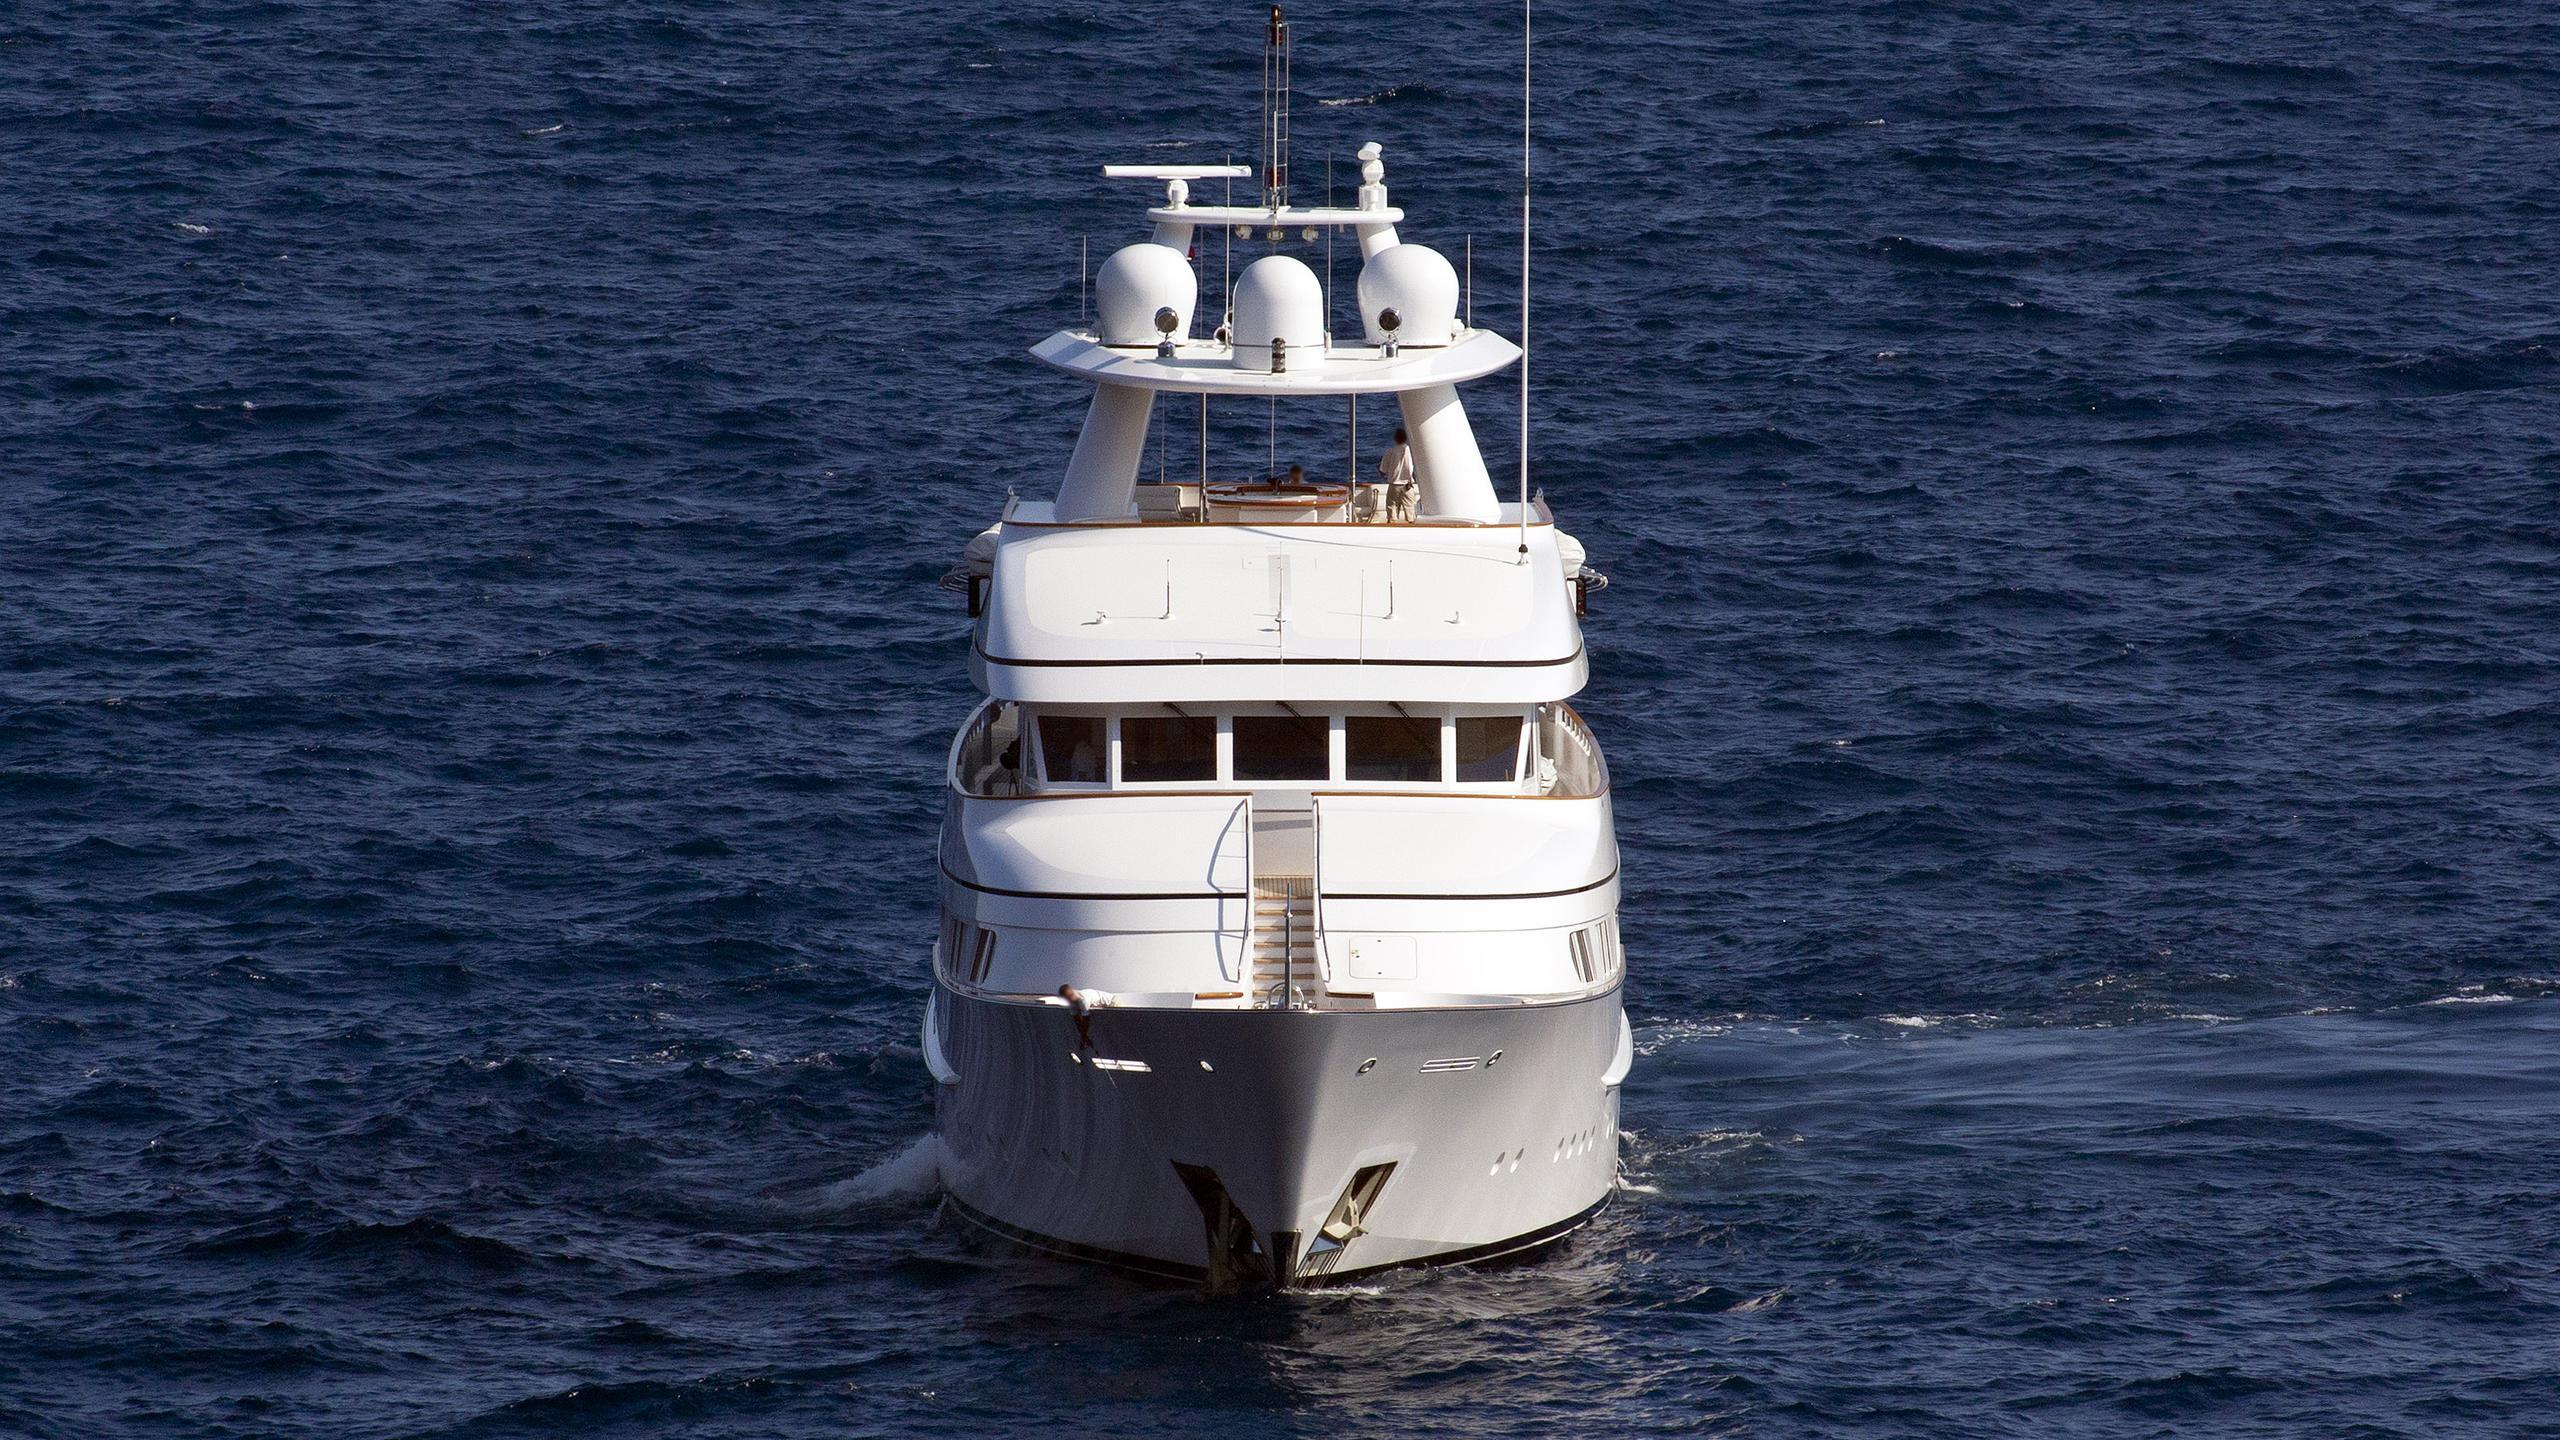 herculina-motor-yacht-feadship-1998-50m-bow